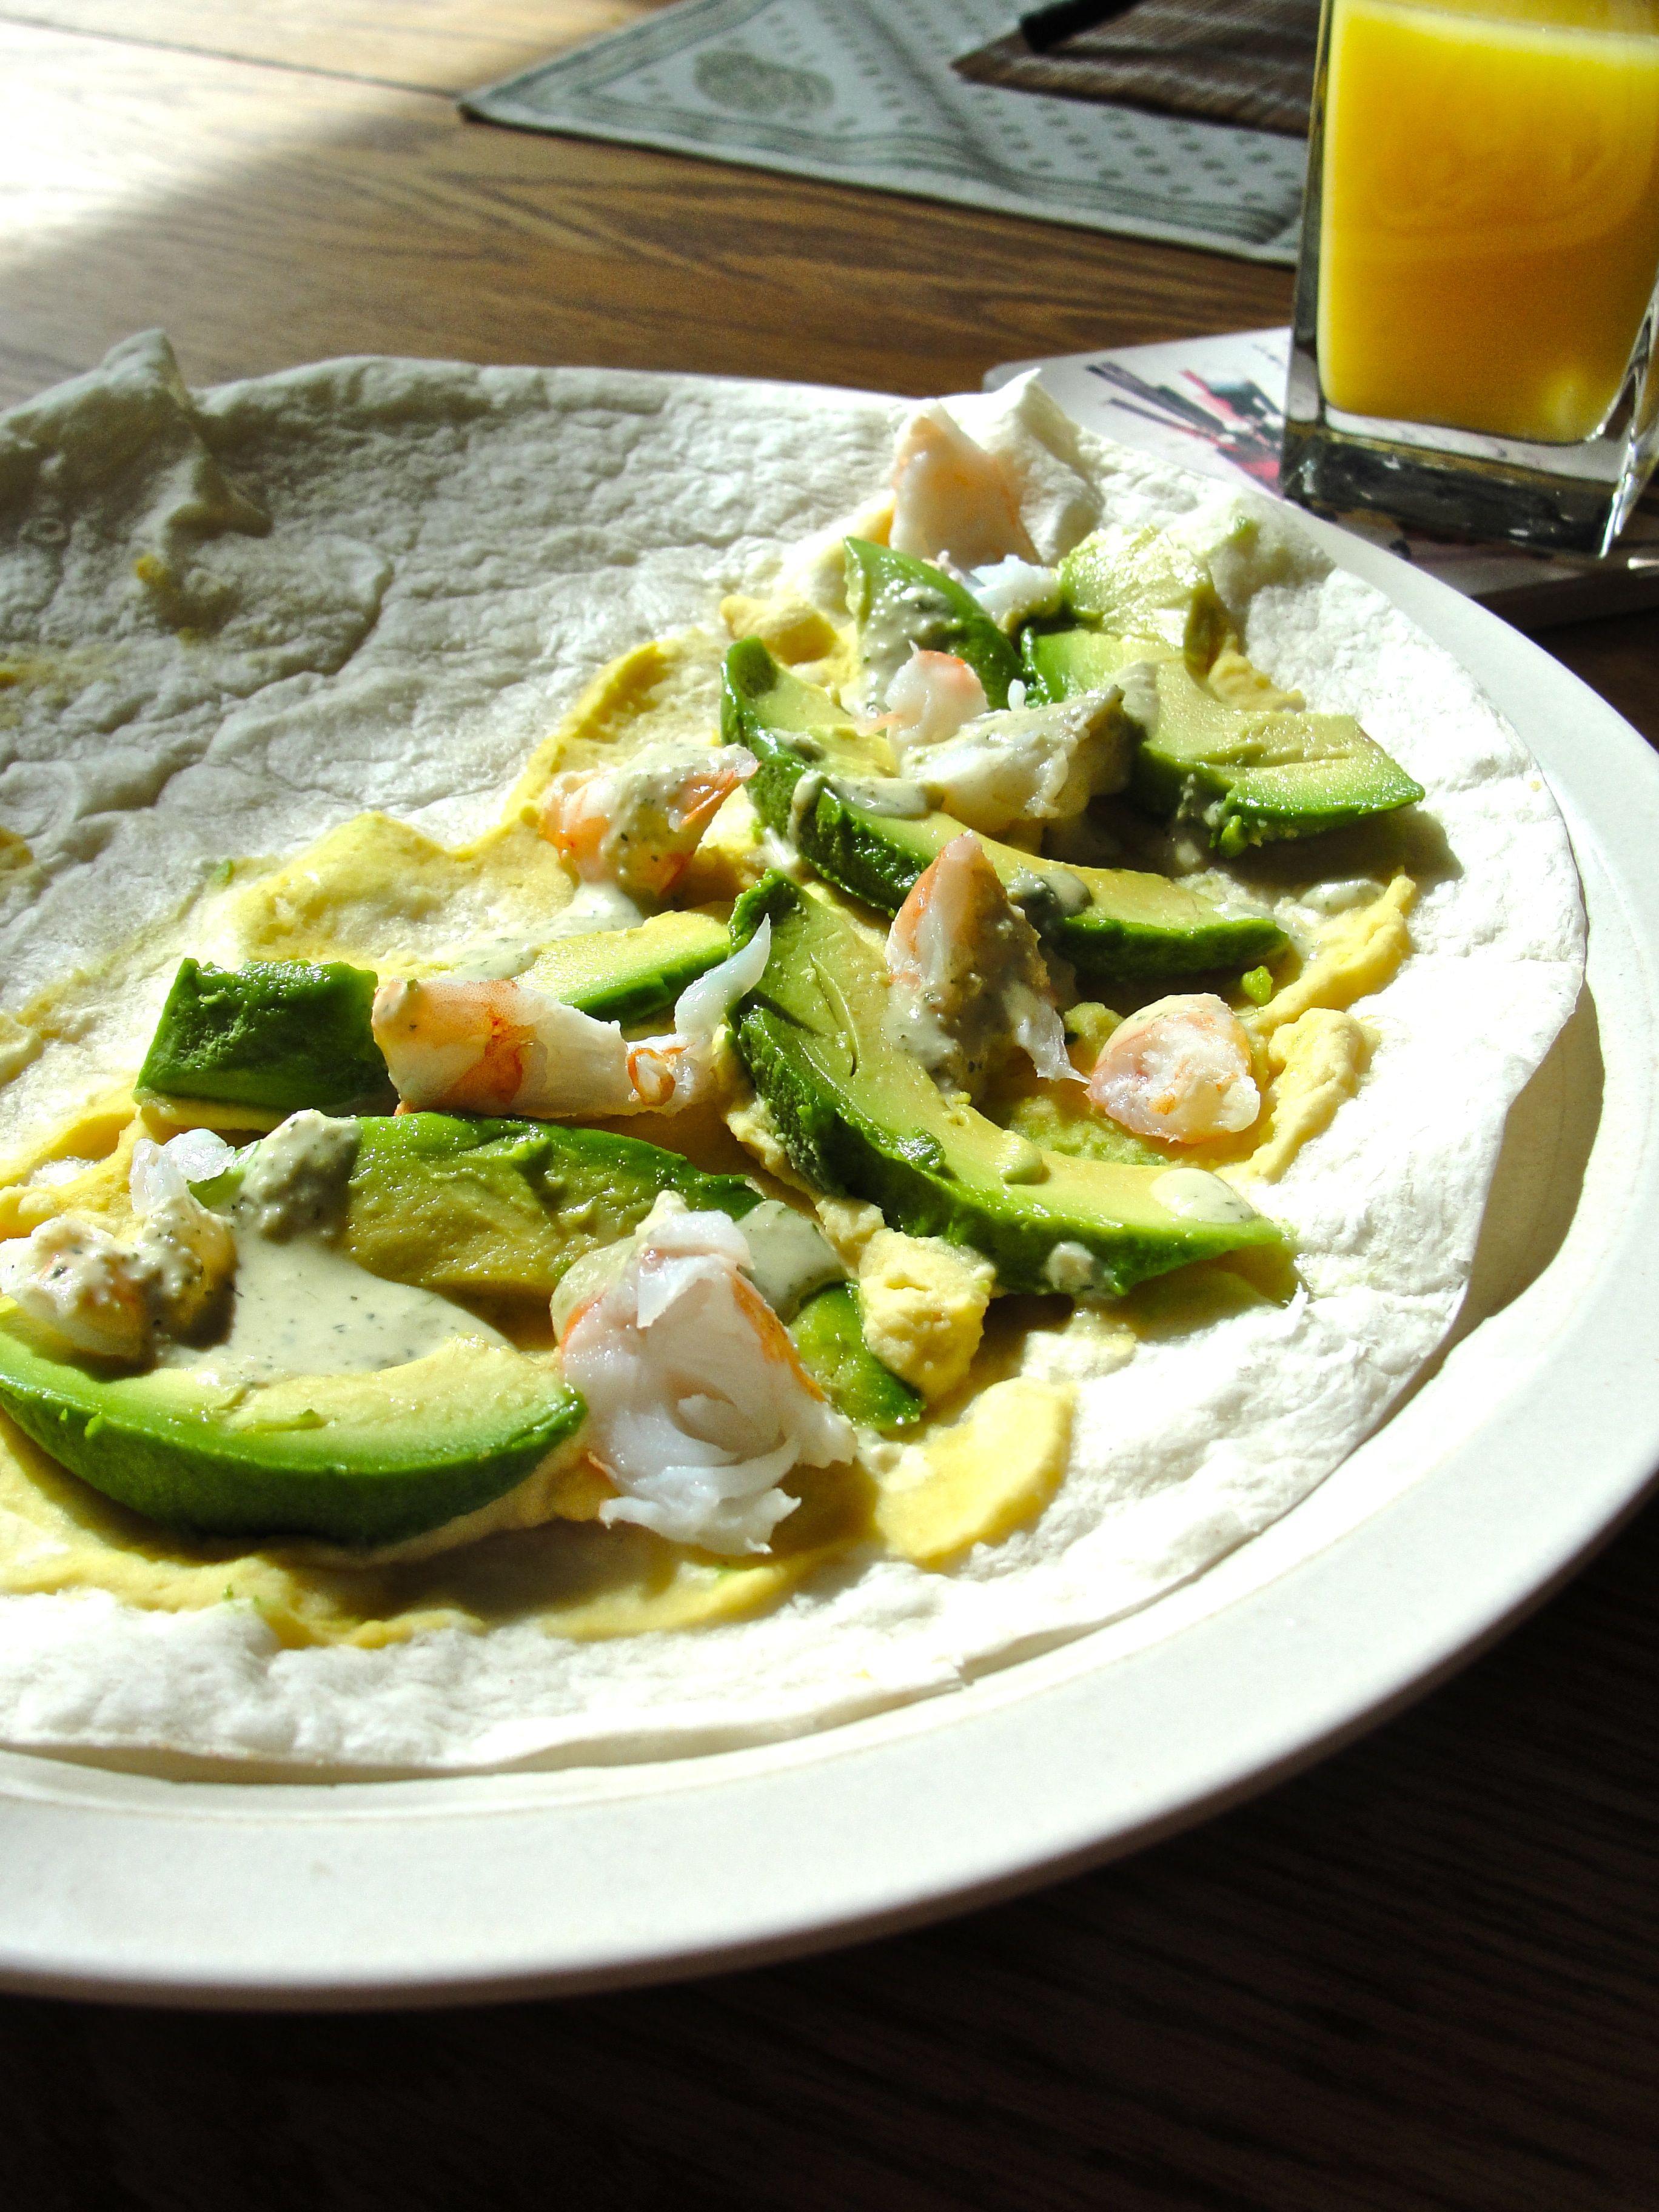 Avocado & Shrimp Quesadilla with Coconut Lime-Peanut Sauce